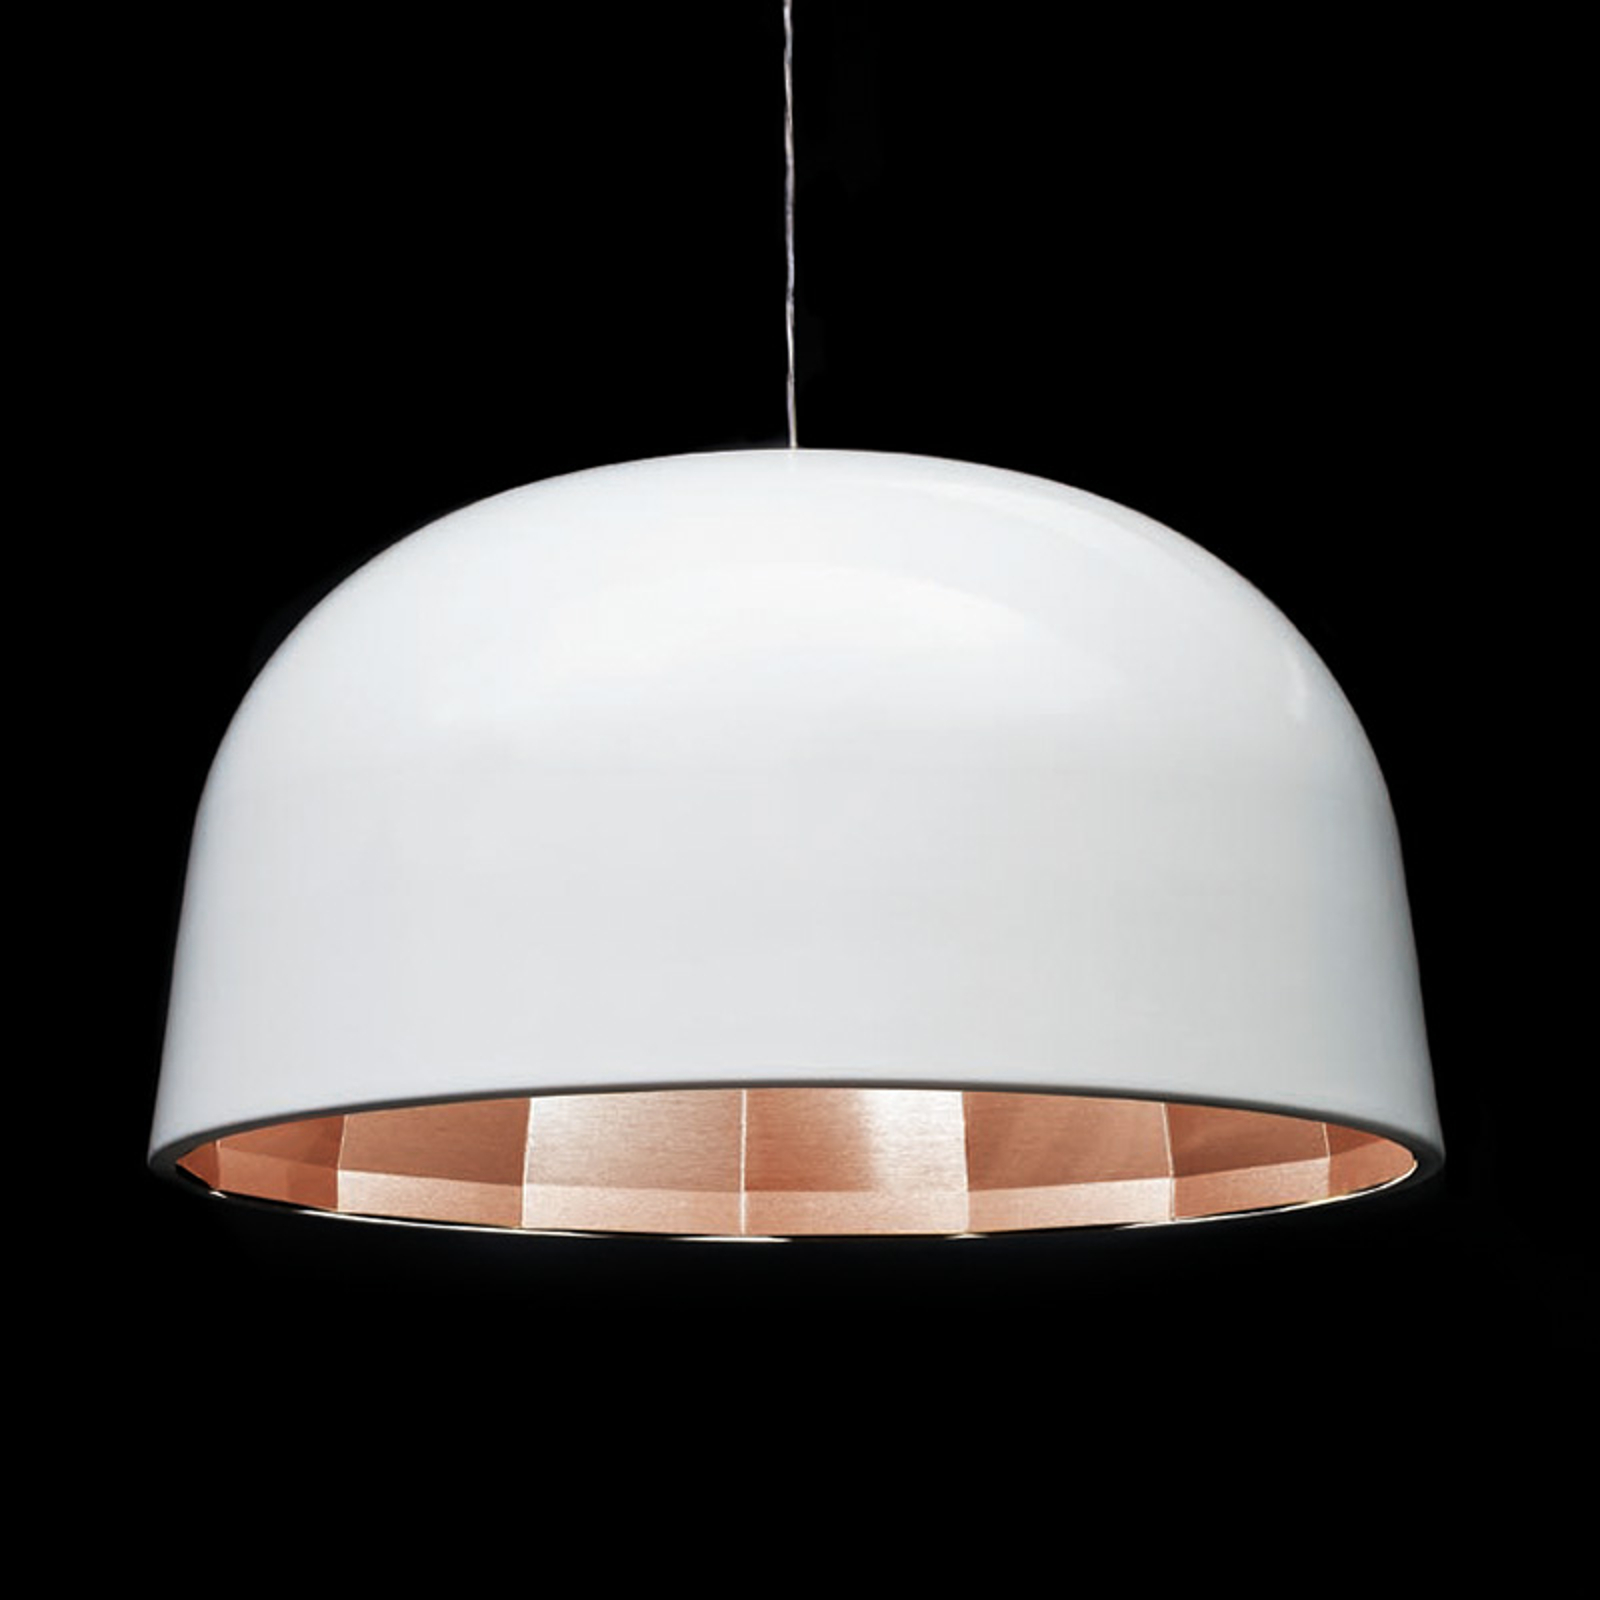 Lampada LED a sospensione Empty, 59 cm, in bianco